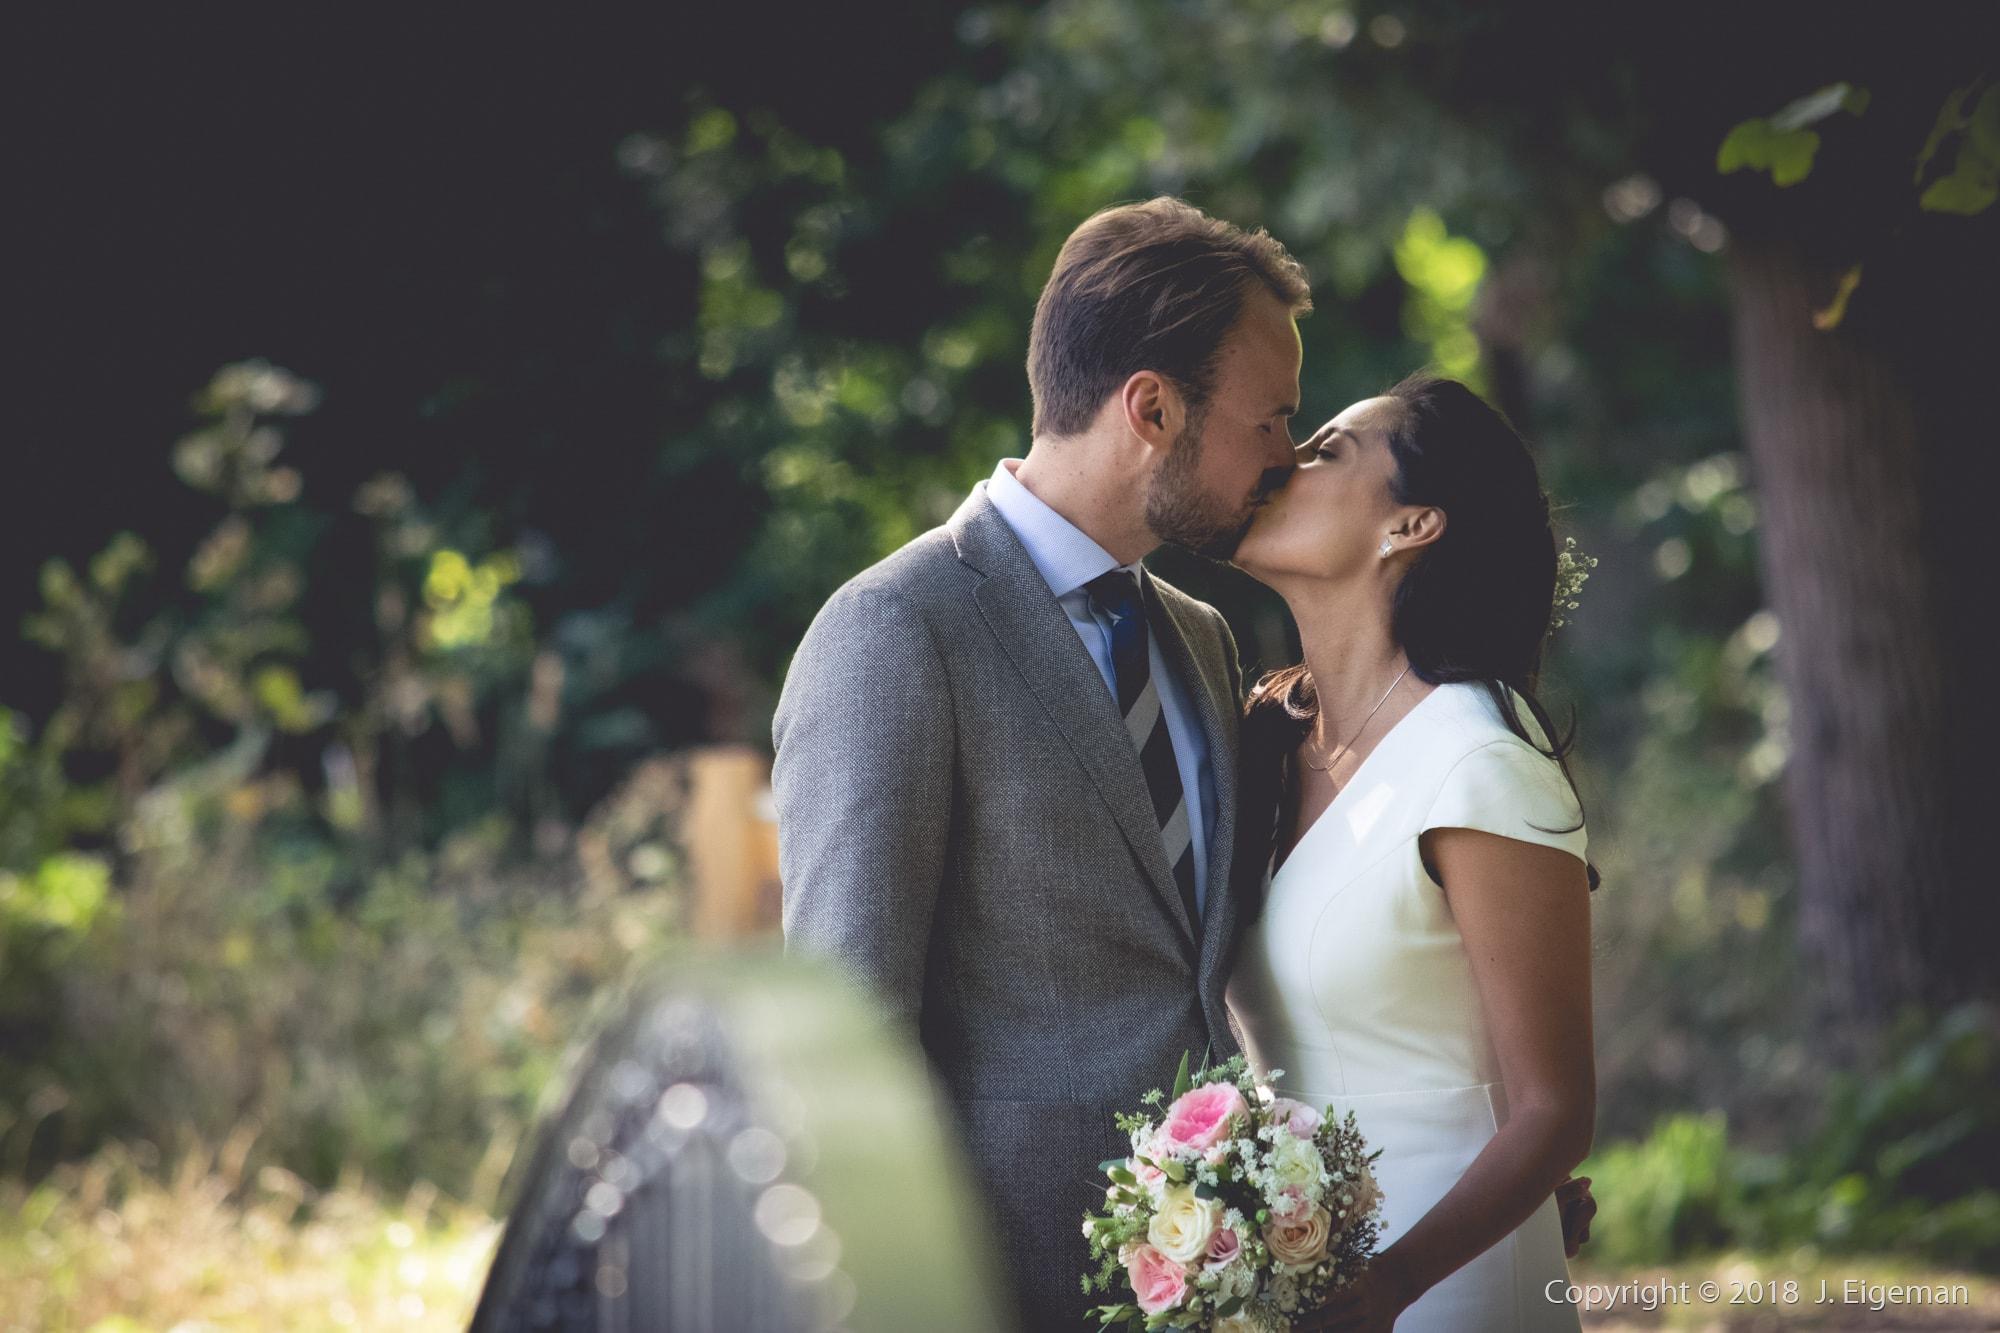 Bruiloft fotografie Poelgeest Oegtstgeest (6)